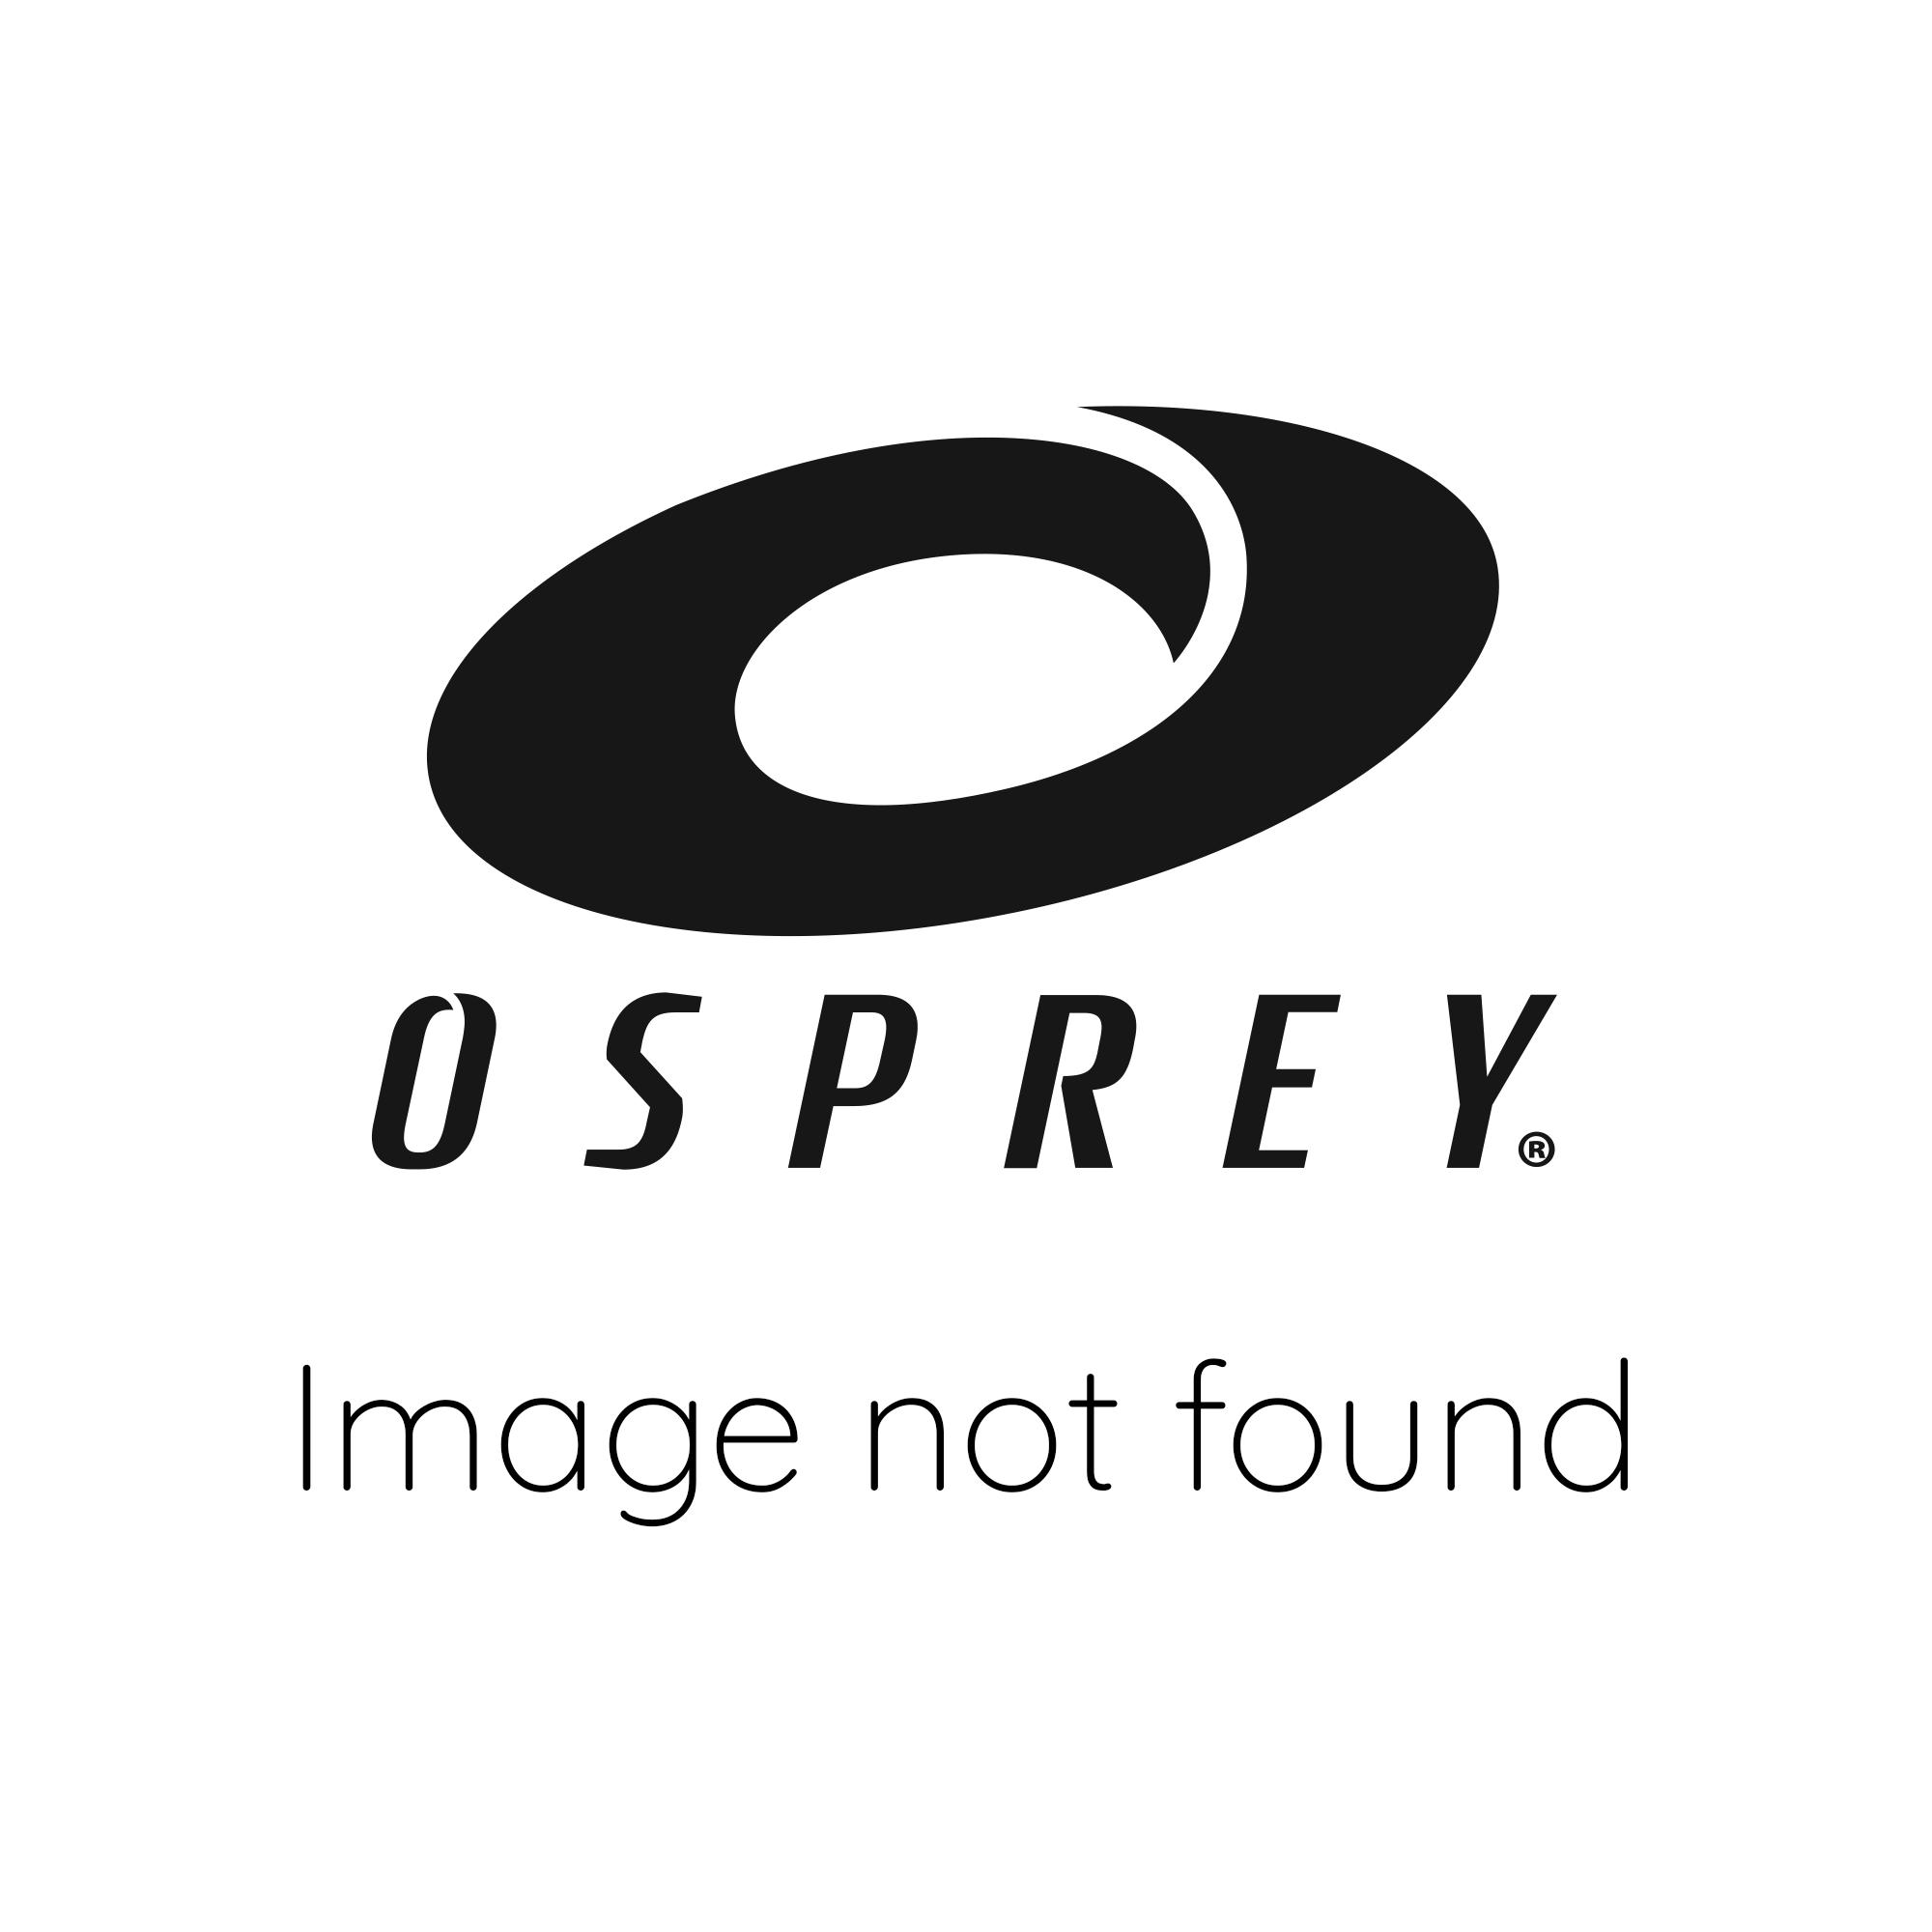 Tom Butler back hand surfing